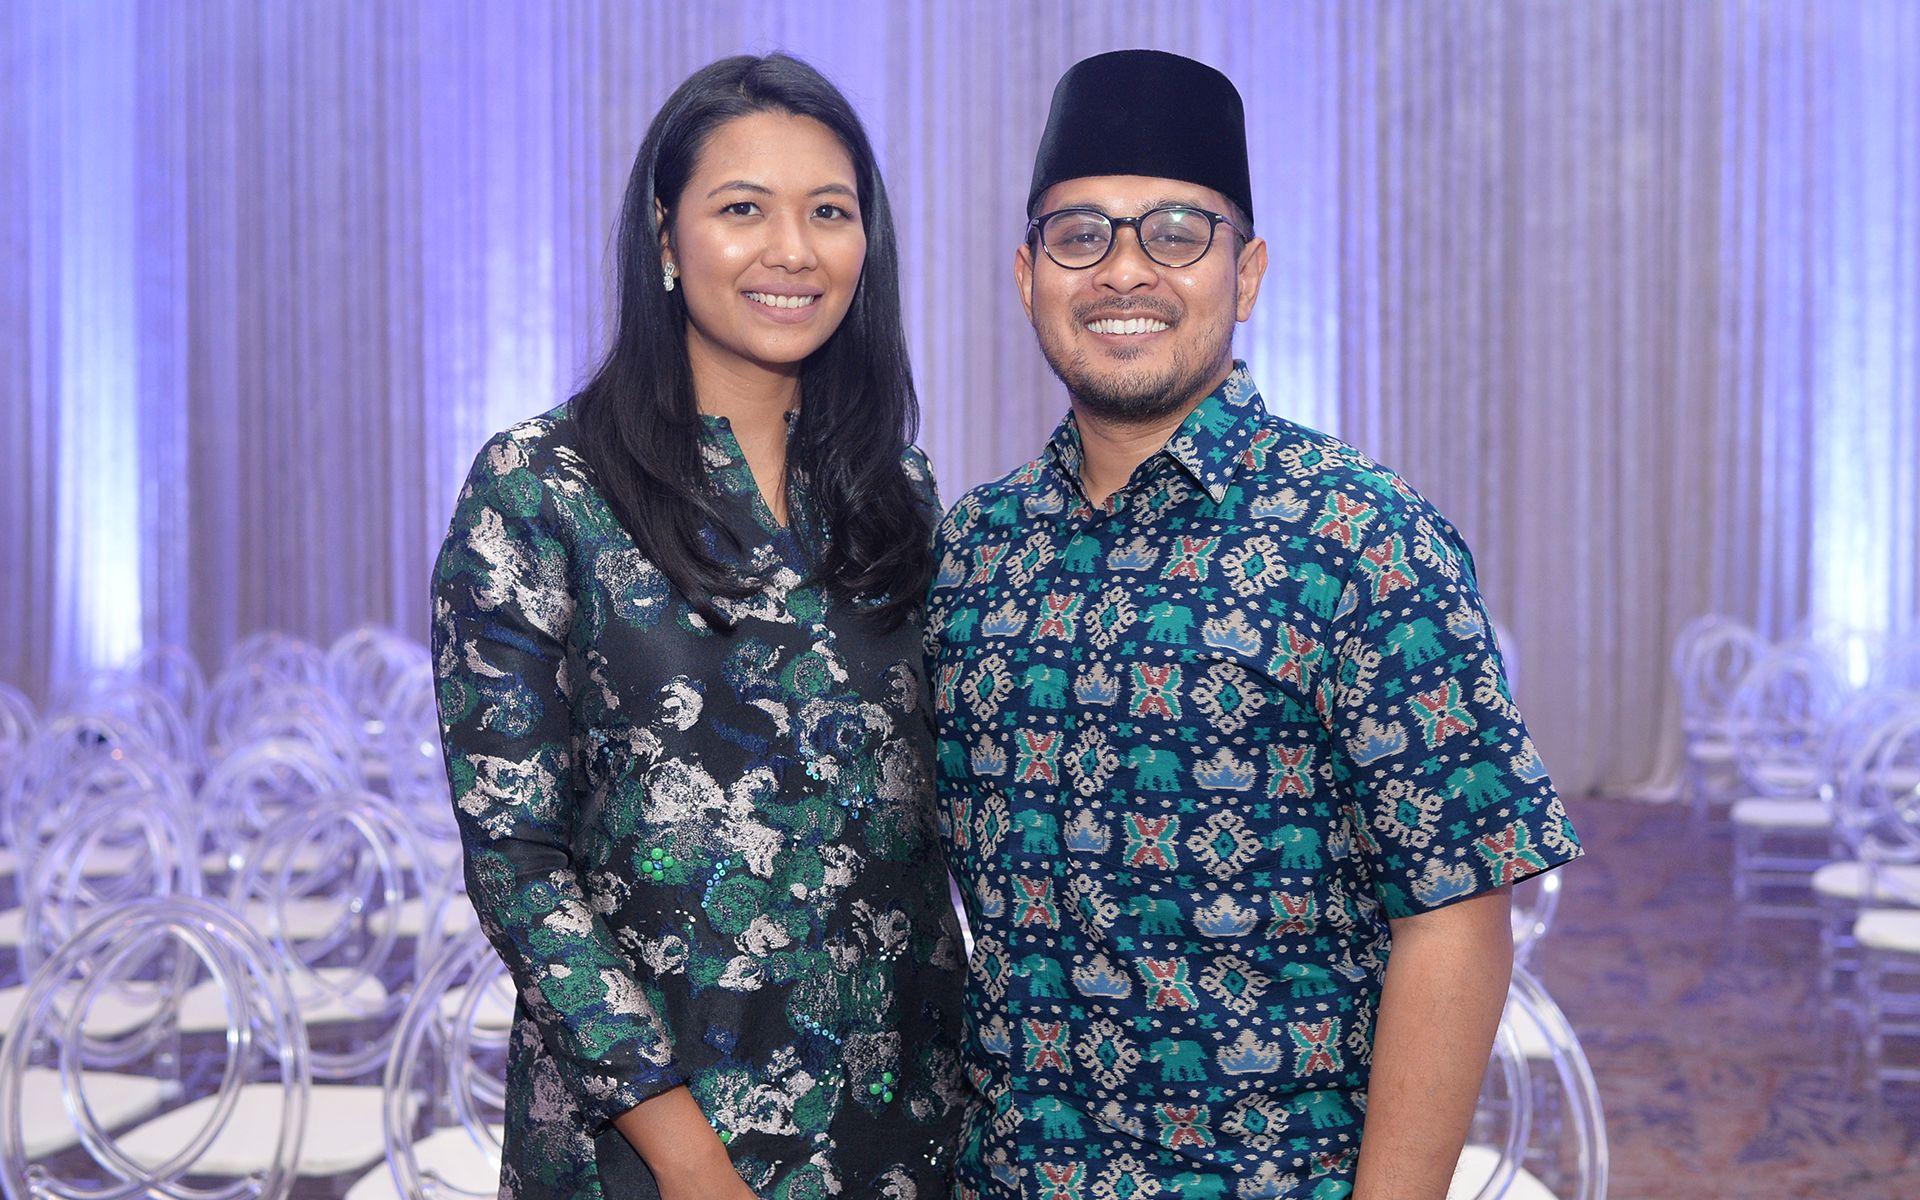 Zaida Ibrahim and Arif Zikri Azizi